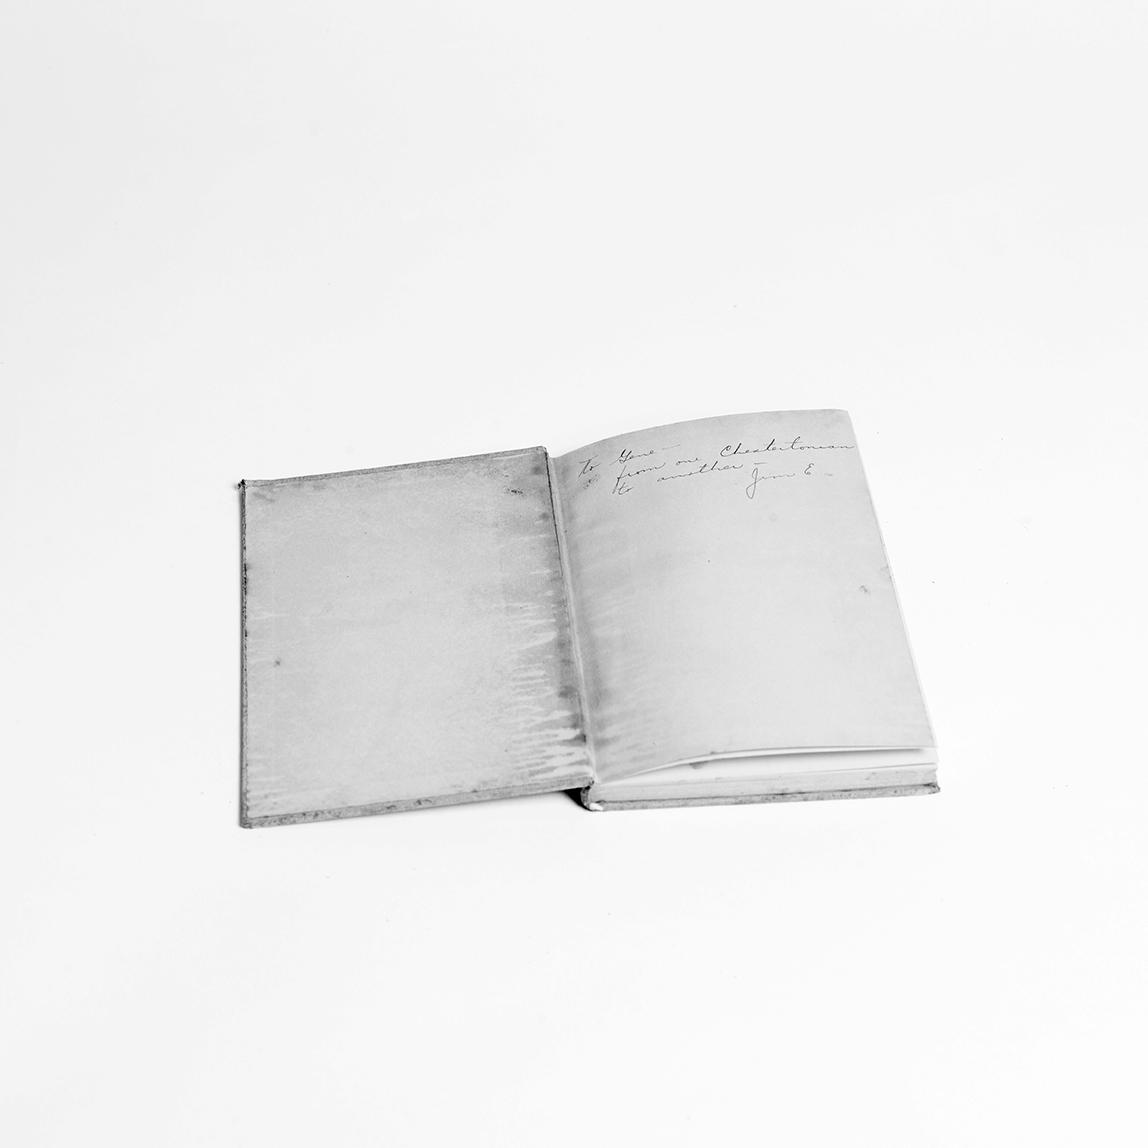 openbook copy.jpg